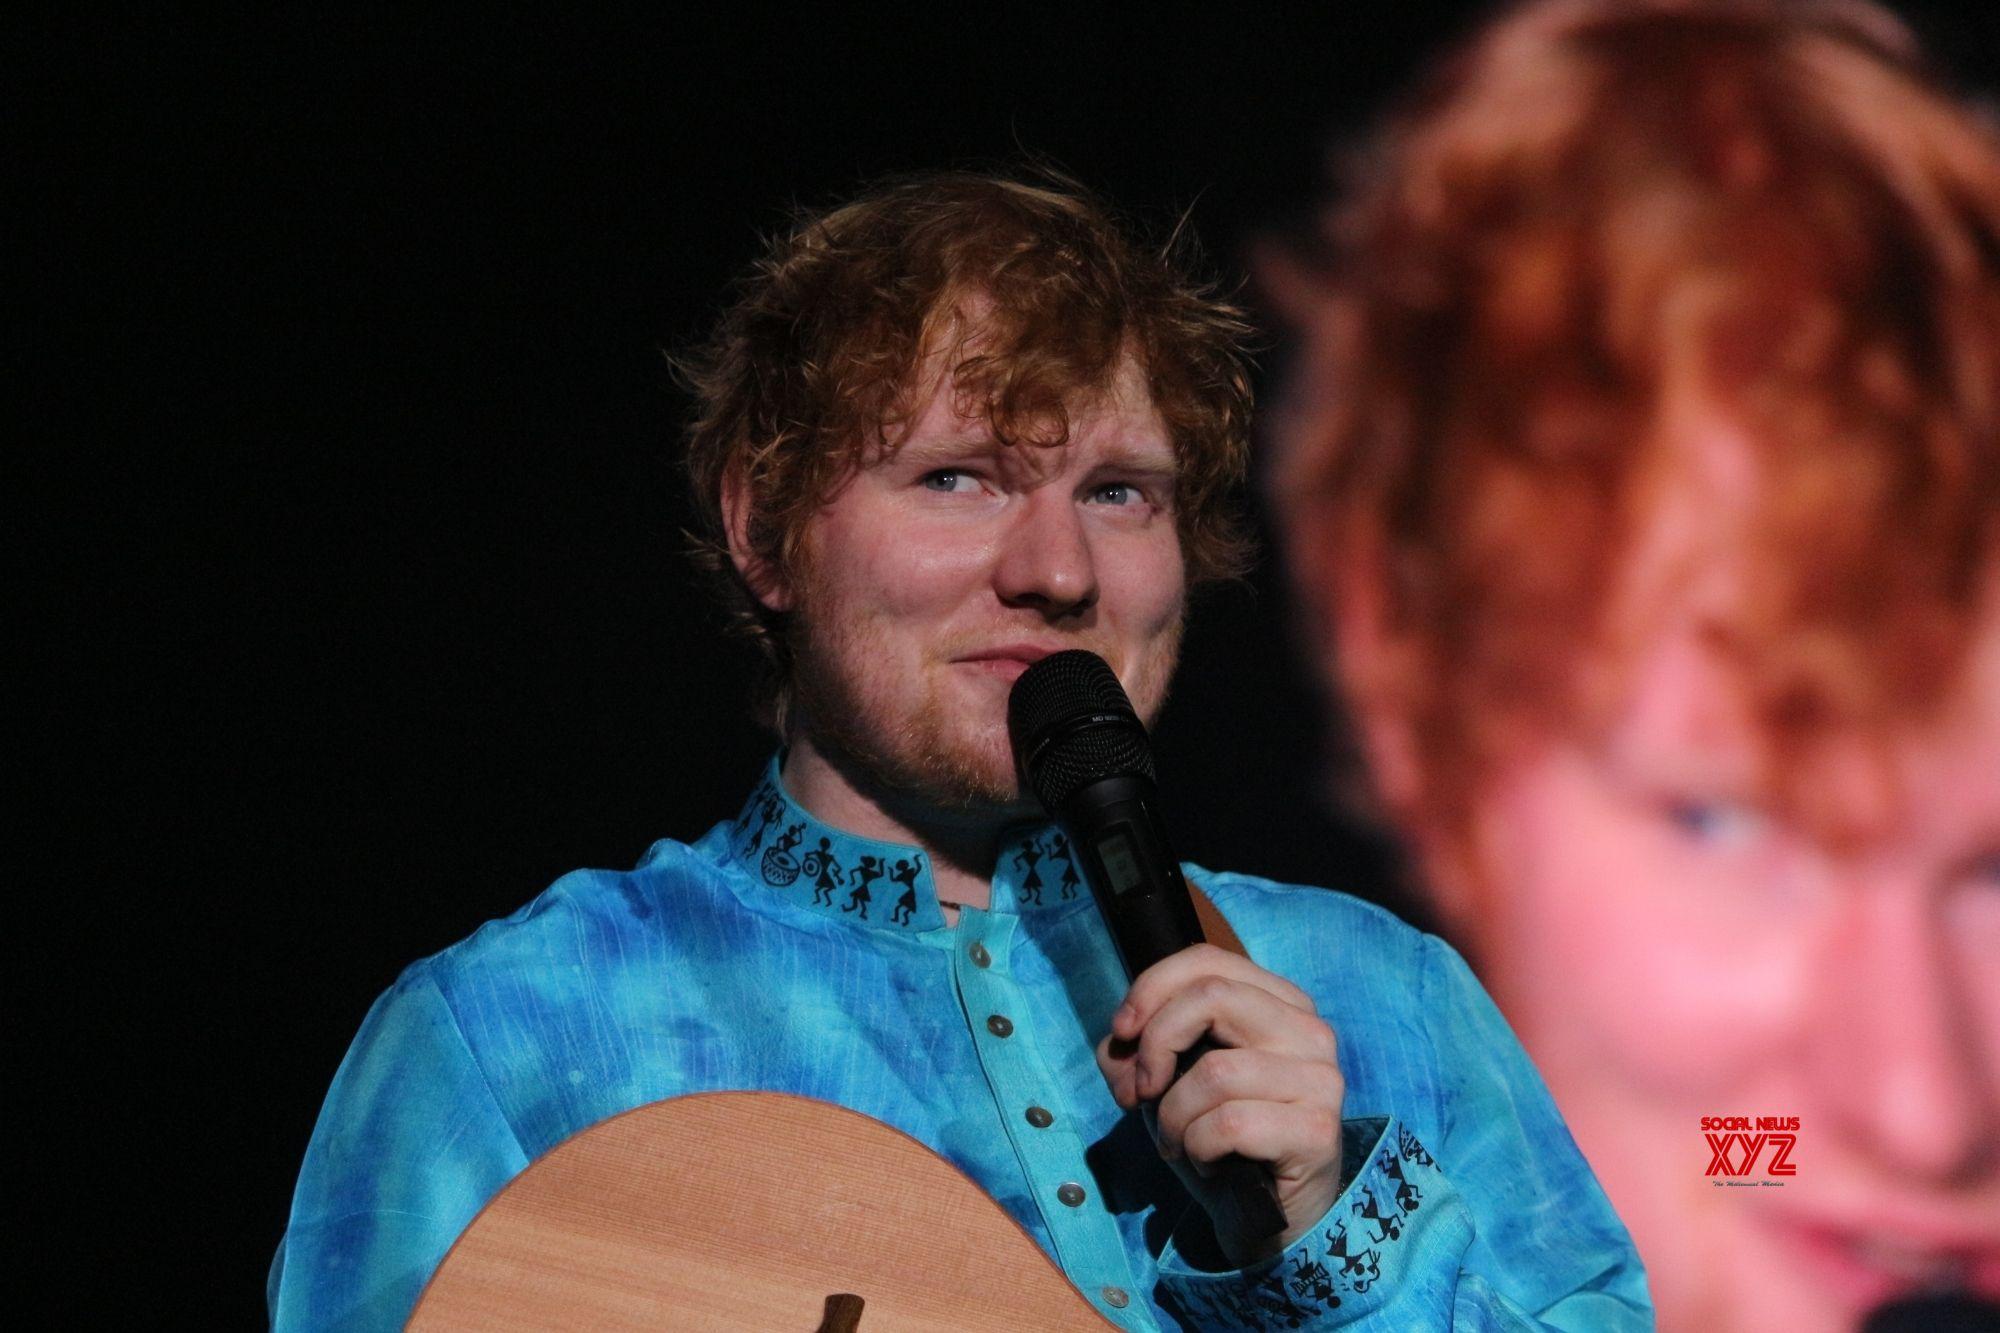 Ed Sheeran set for cameo in Danny Boyle's next